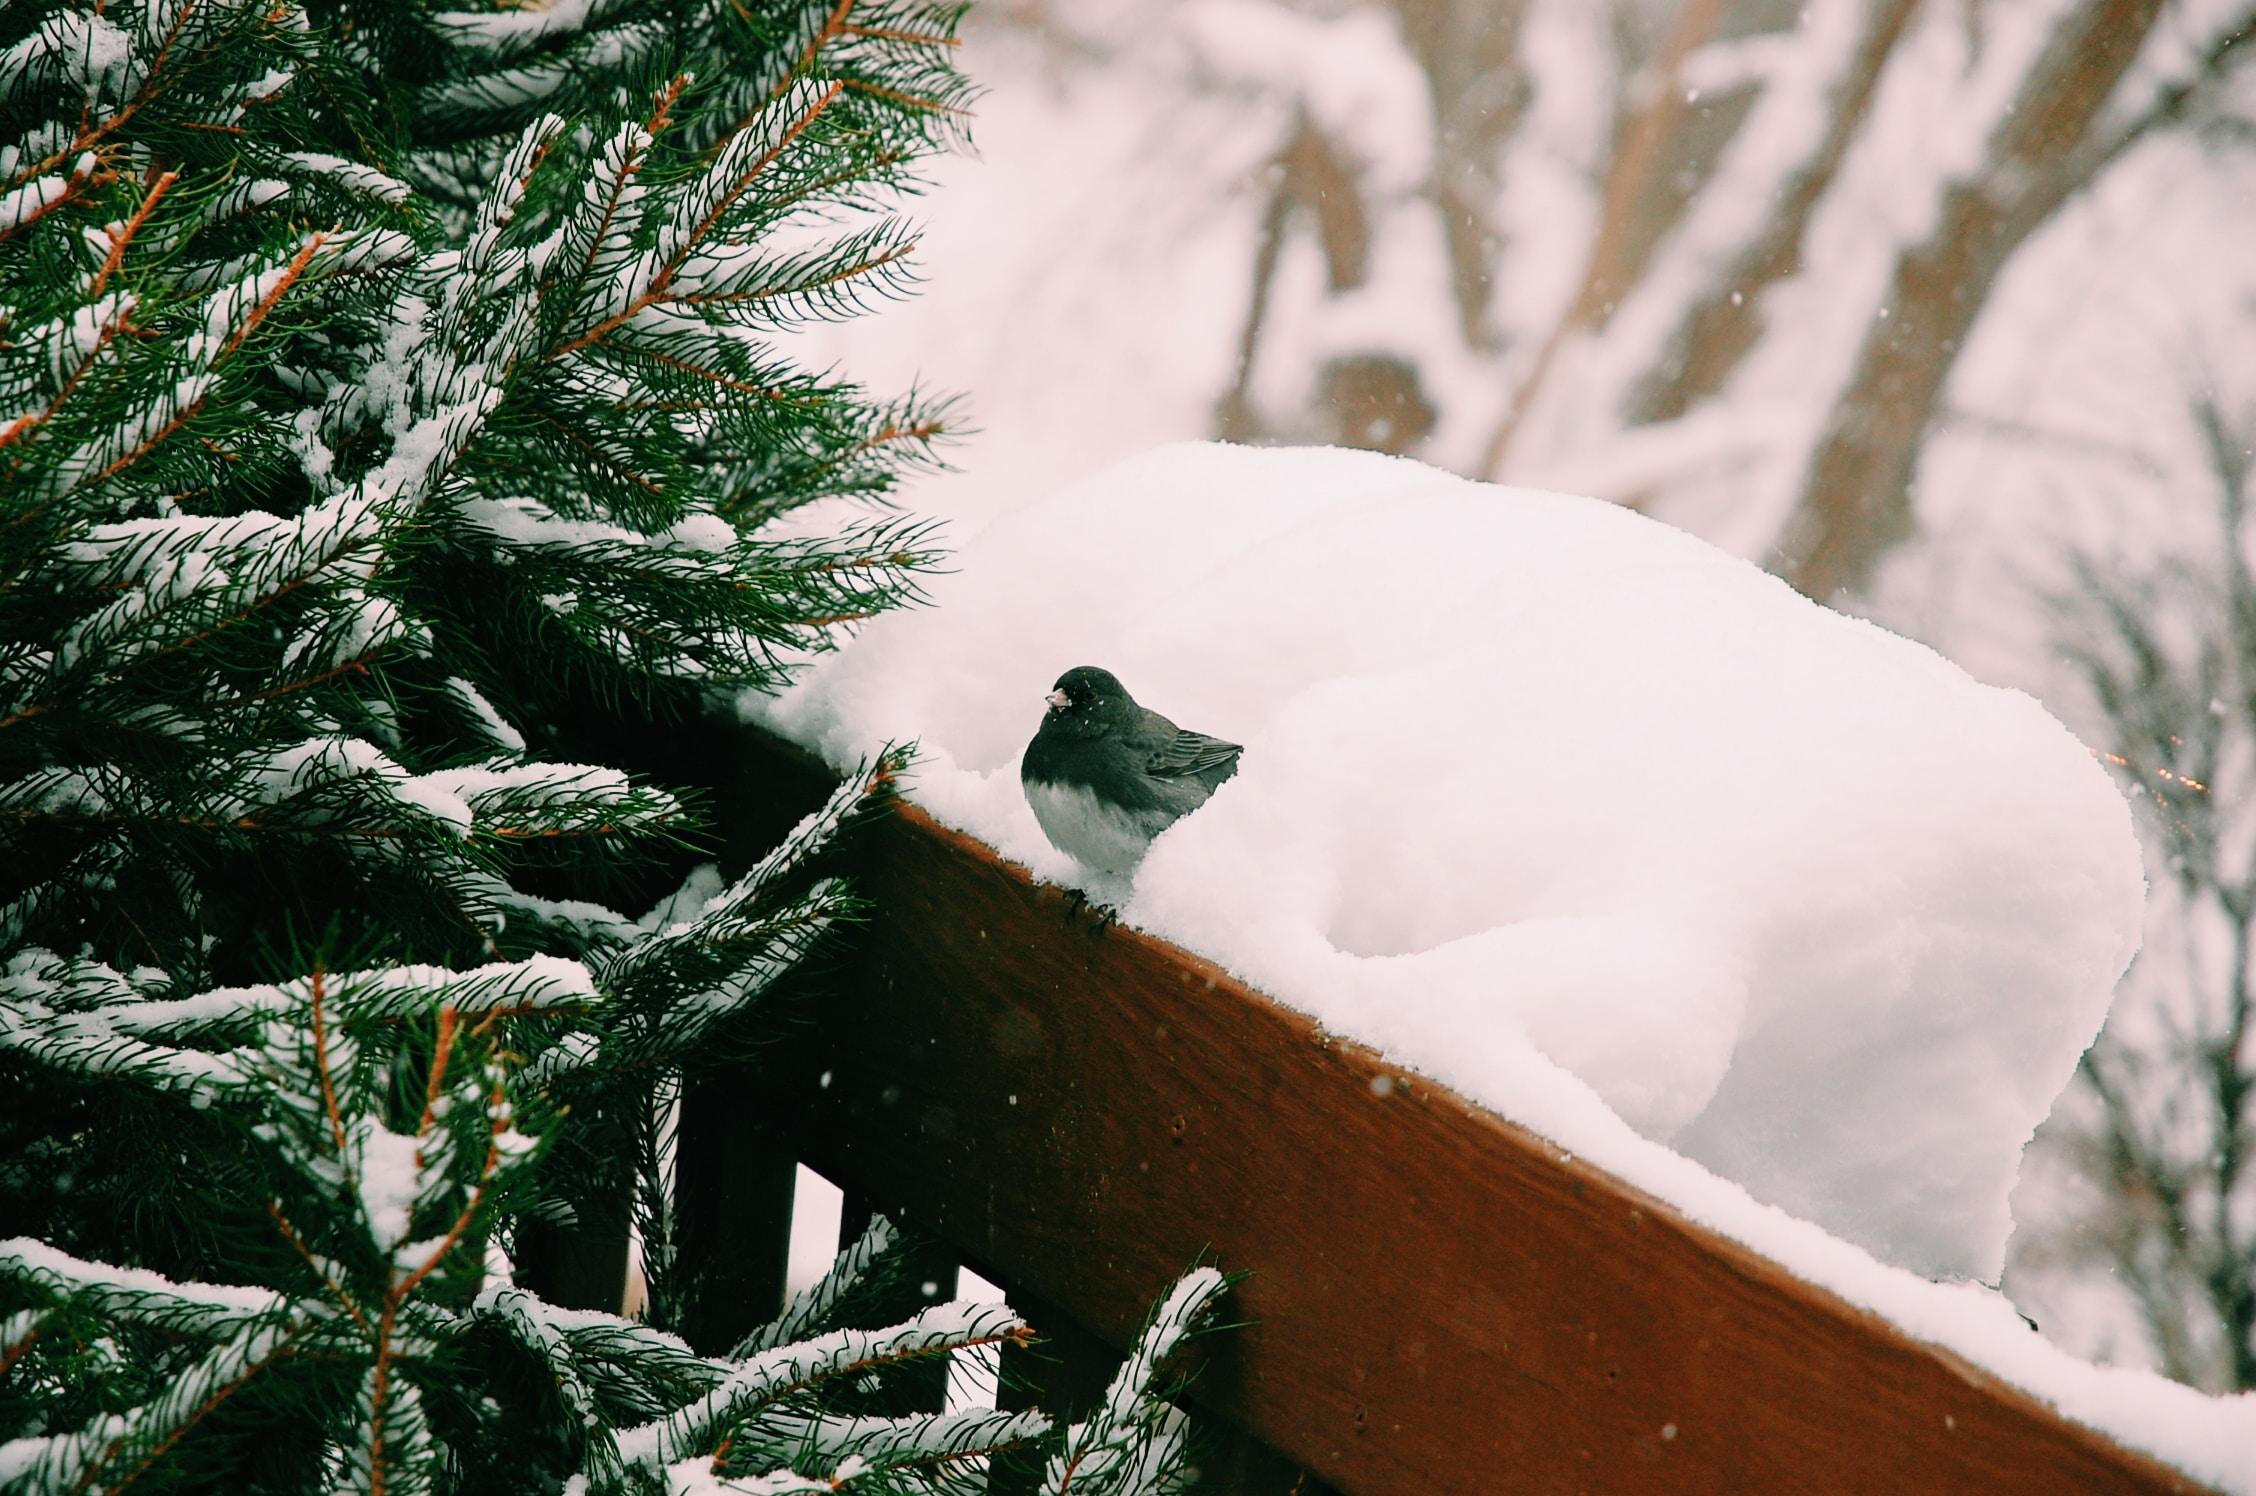 bird perching on wooden surface